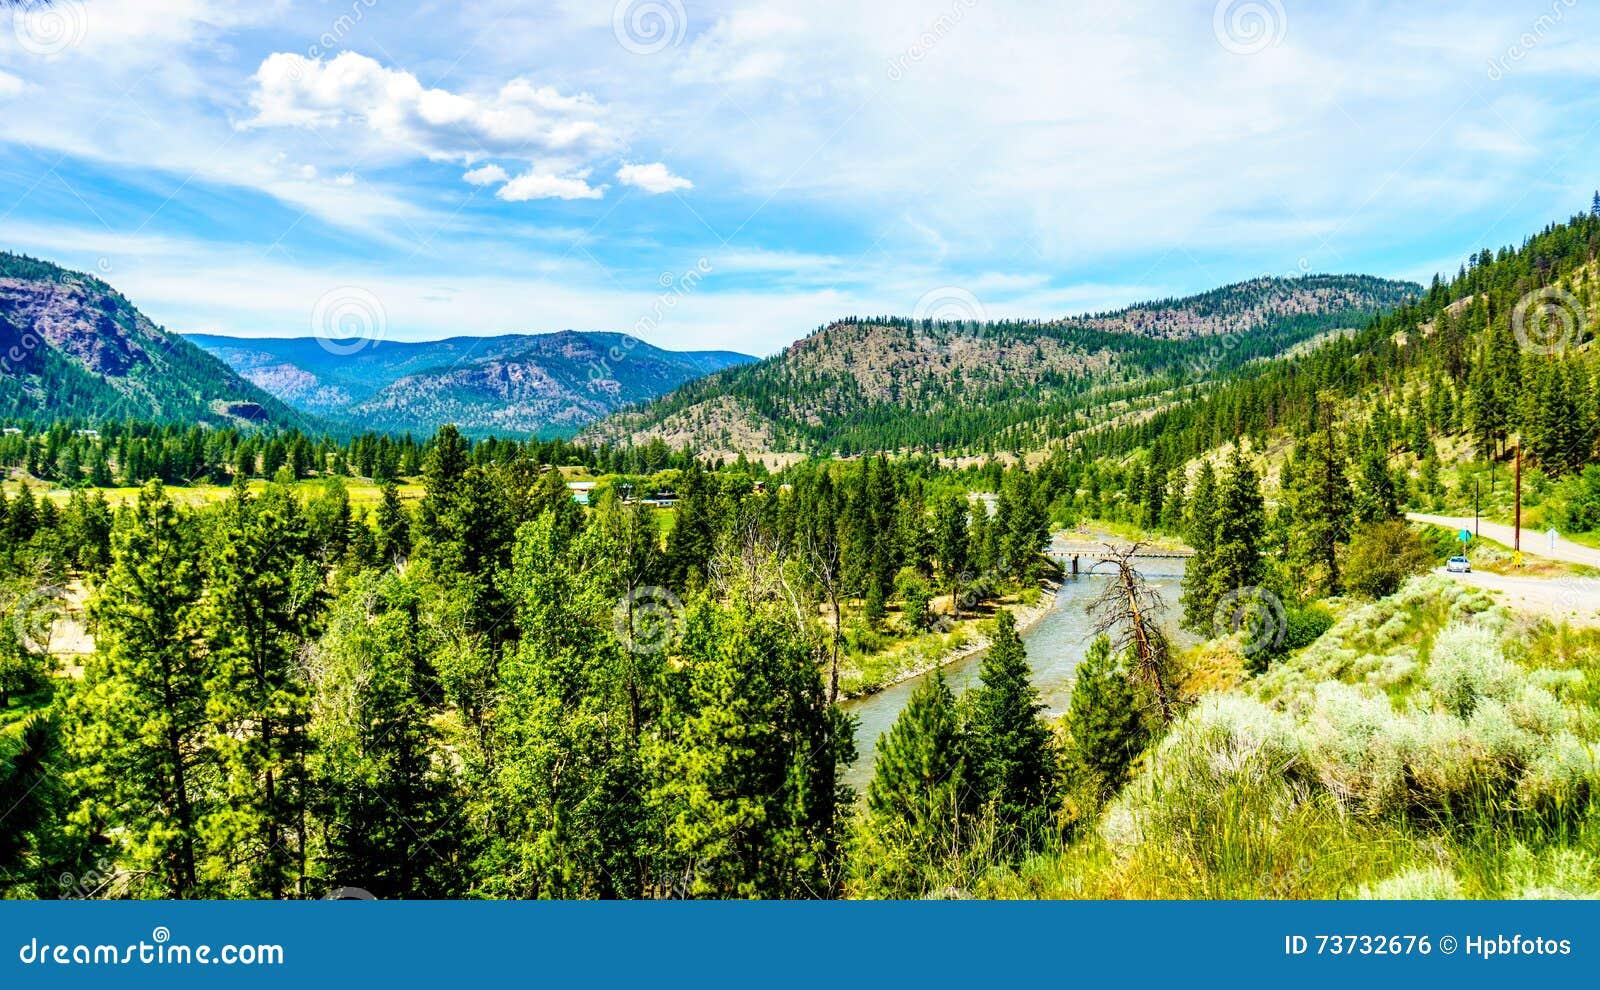 The Nicola River flows through the Lower Nicola Valley near Merritt, British Columbia